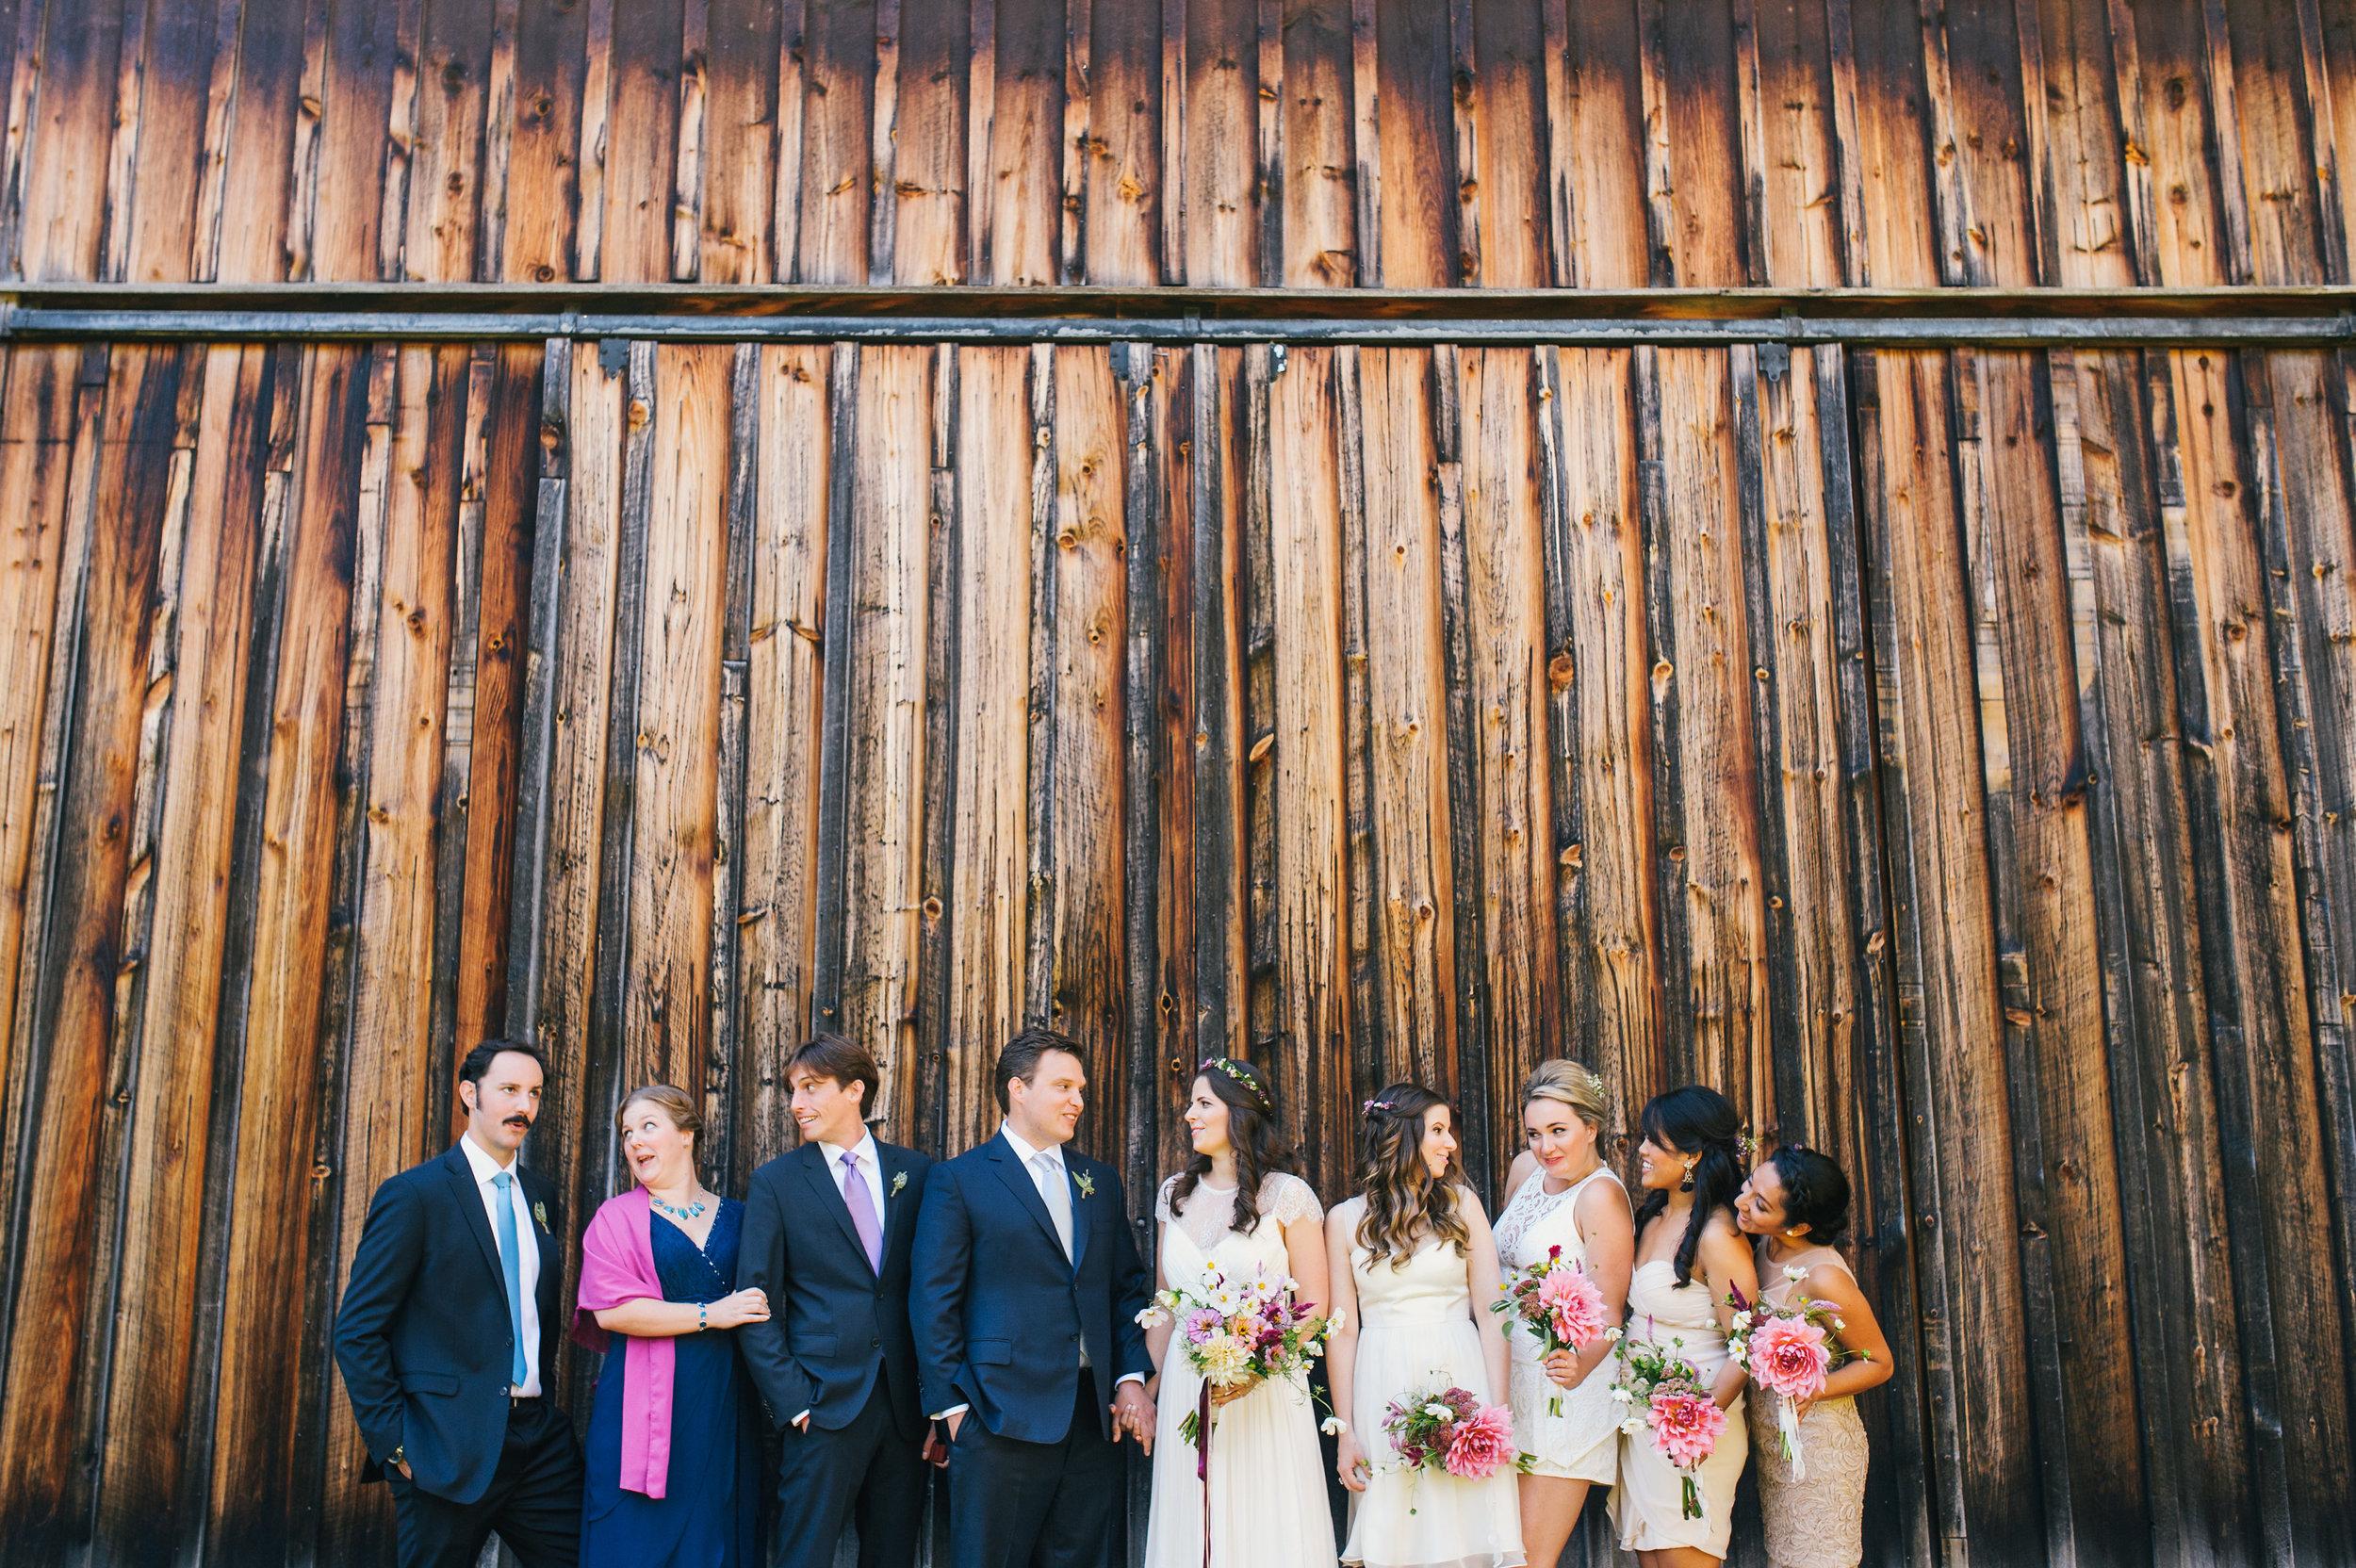 marial-daniel-wedding-balls-falls-sara-wilde-photography-0184 (1).jpg